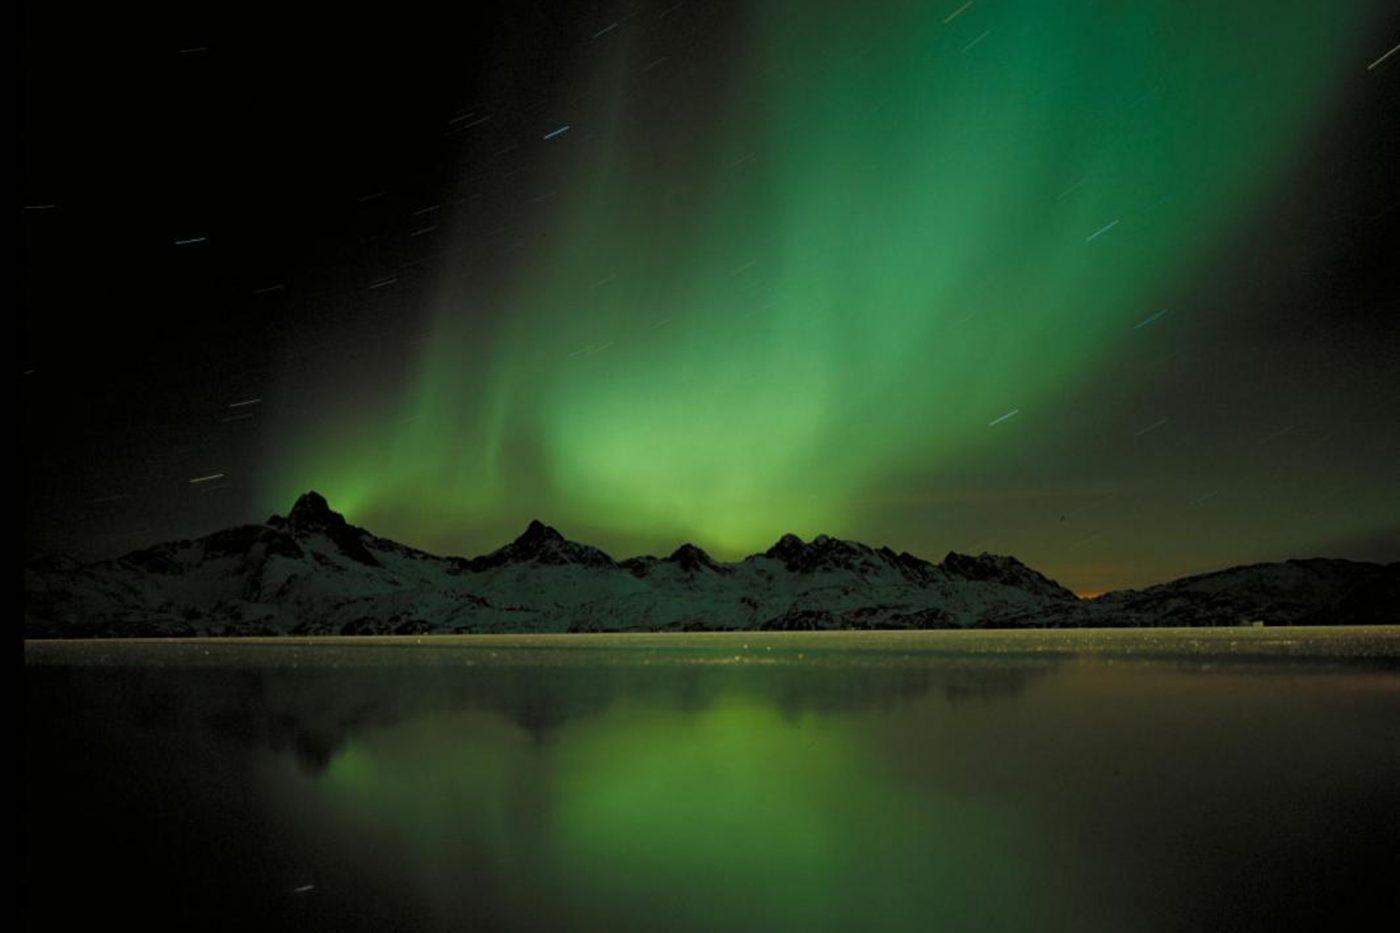 Grönlandsresor: Scoresbysund – Aurora Borealis, M/S Plancius